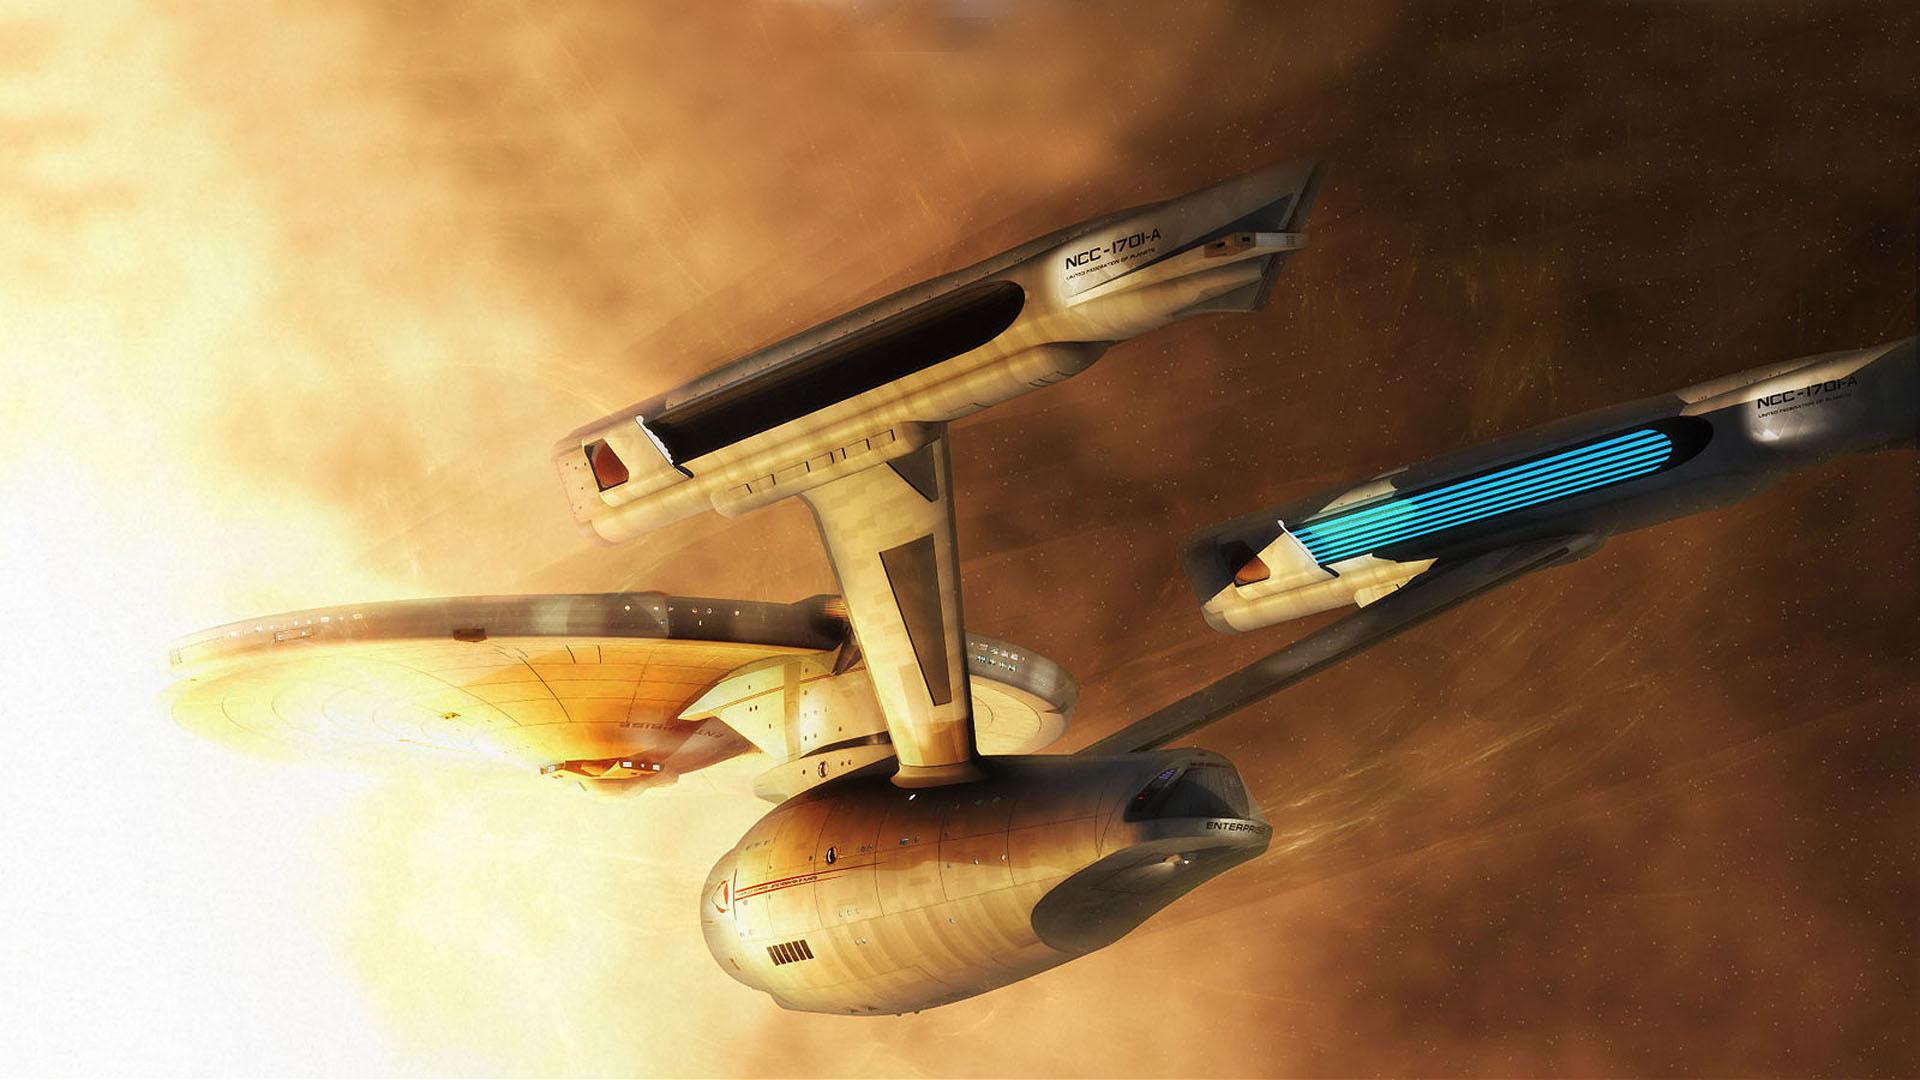 General 1920x1080 Star Trek USS Enterprise (spaceship) spaceship science fiction artwork